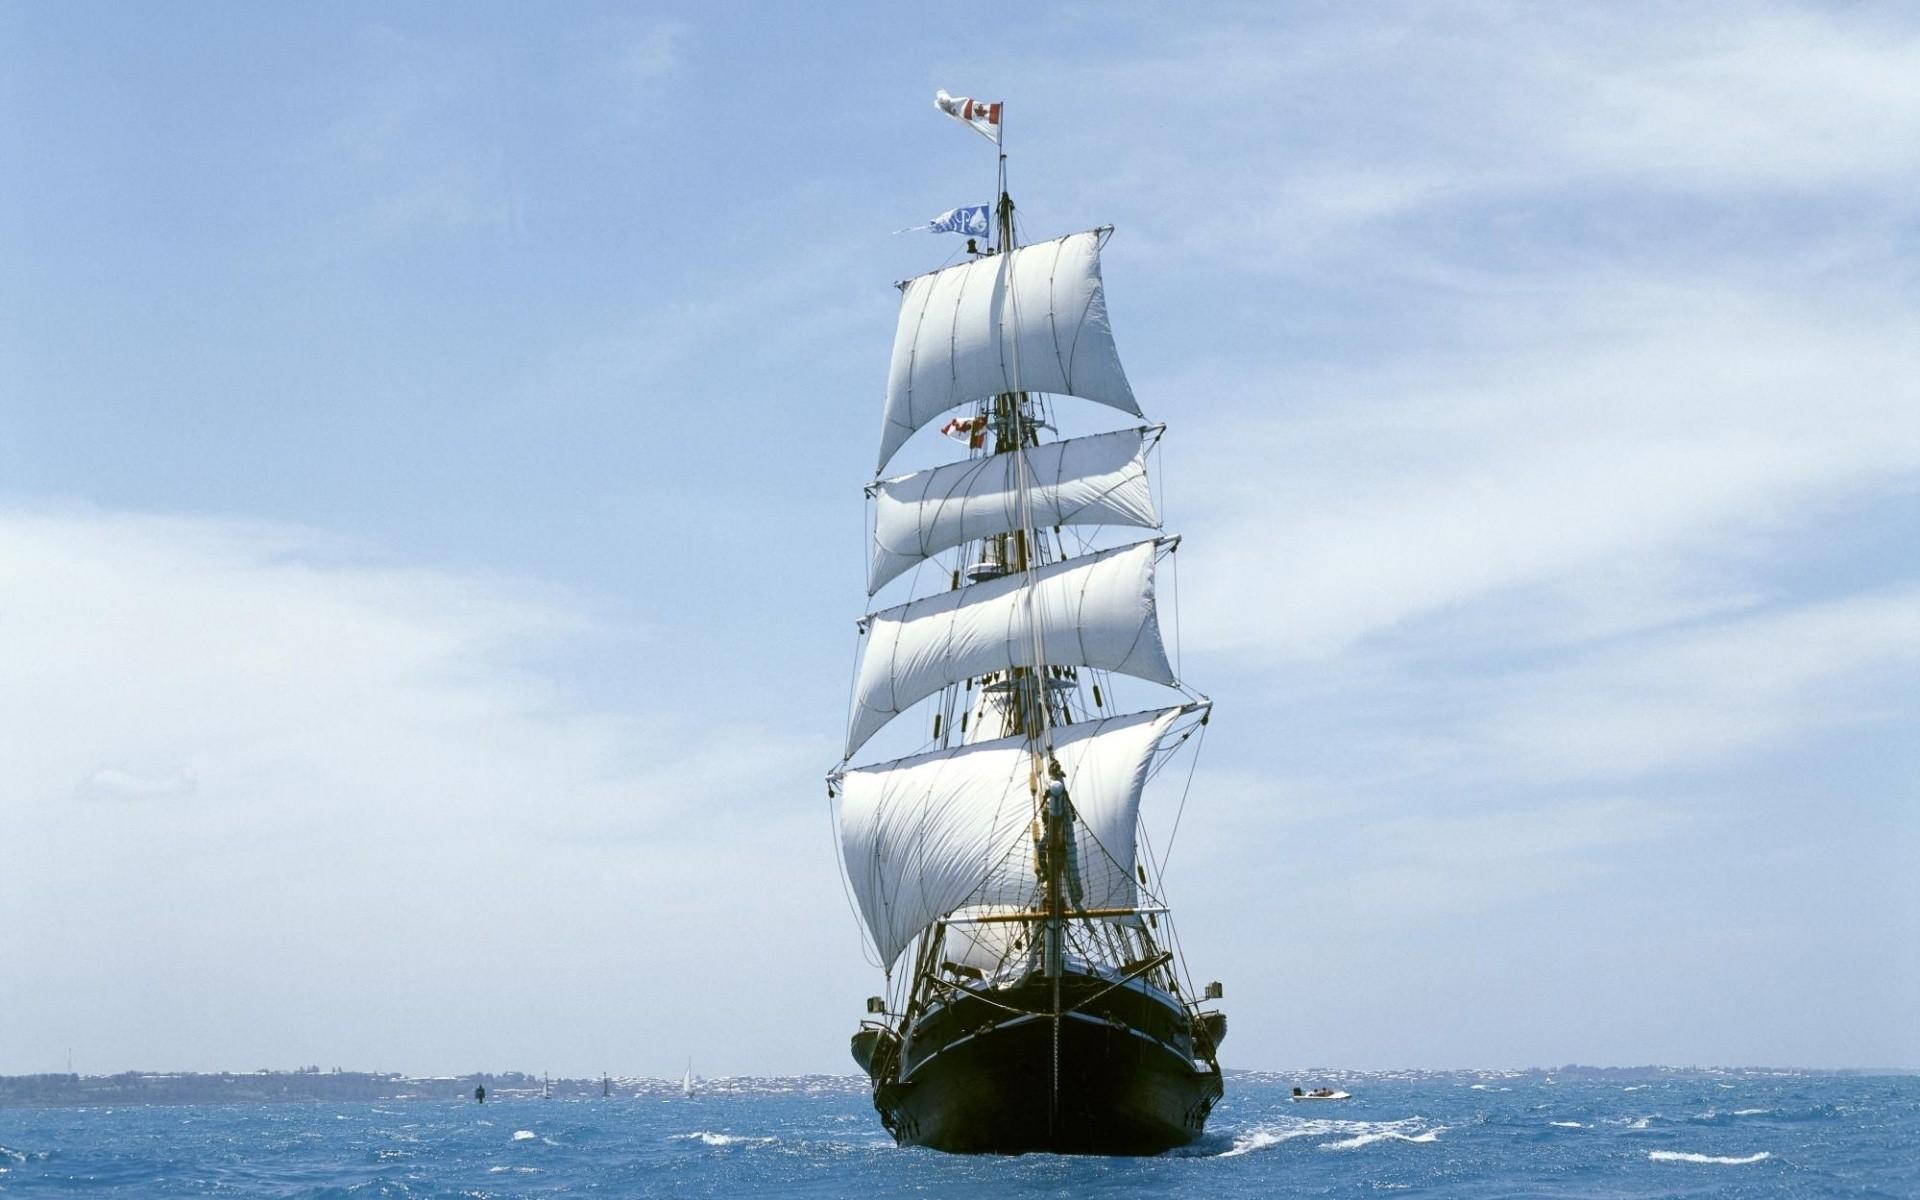 Res: 1920x1200, Tall Ship Wallpaper Hd